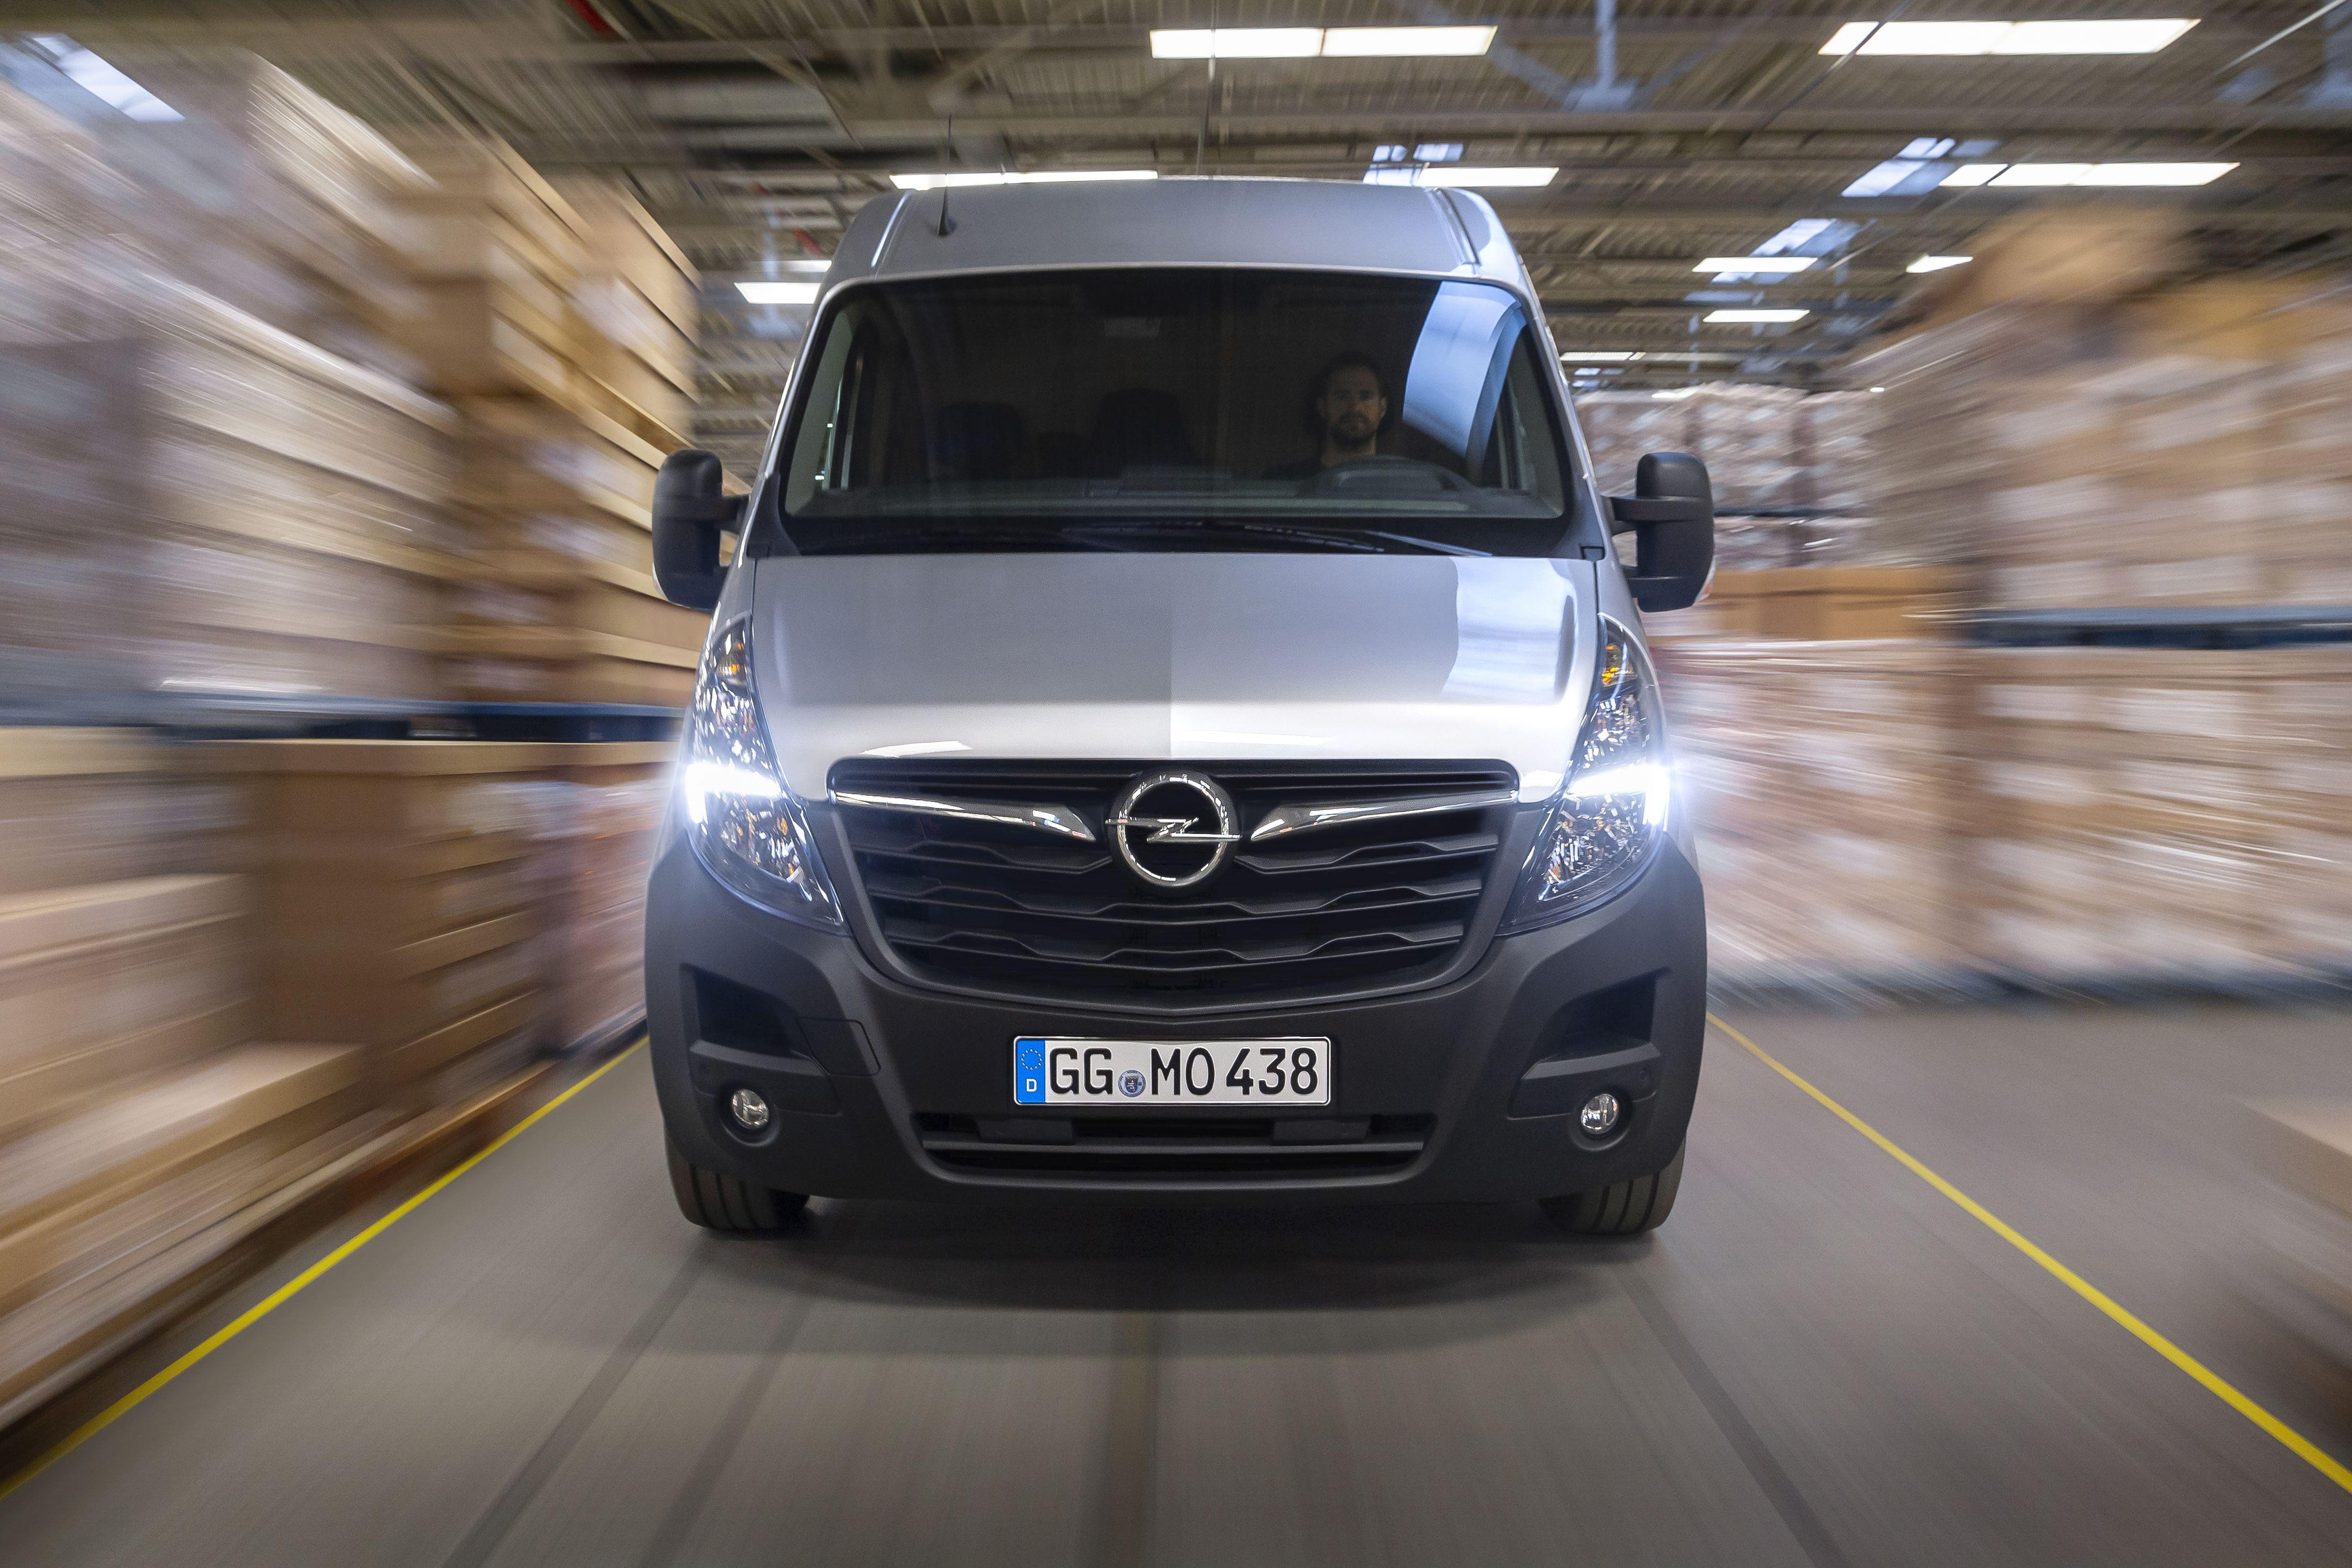 Computernimhandwerk On Twitter Opel Automotive News Apple Car Play